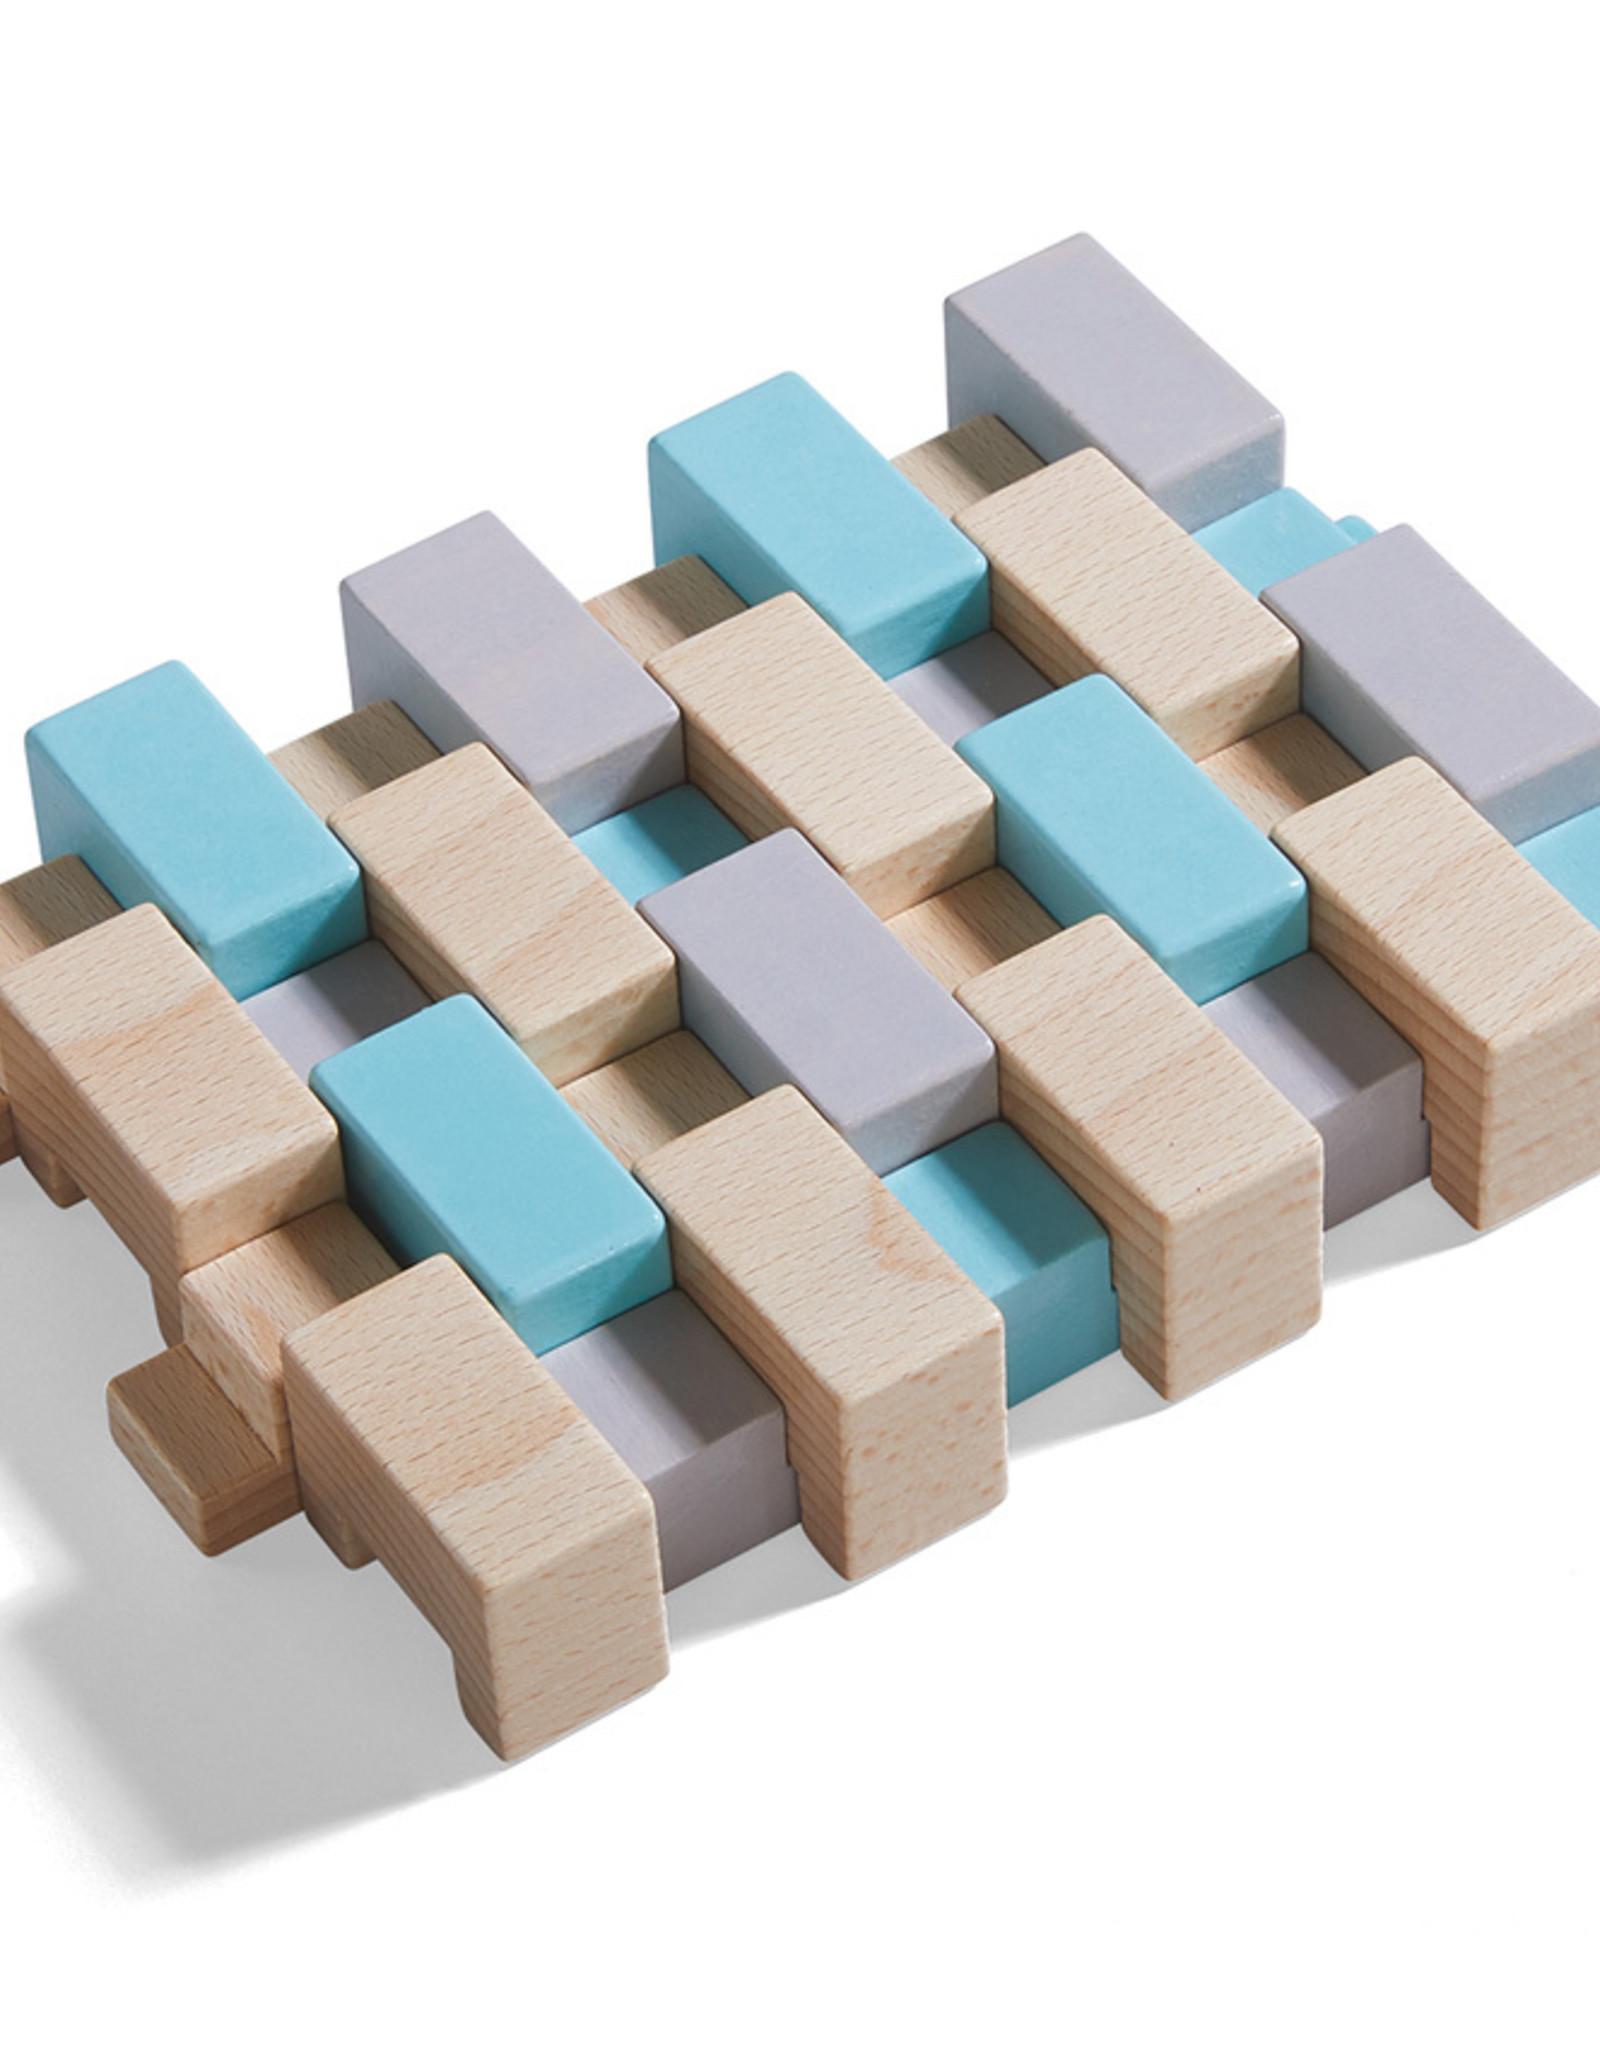 Haba HABA - 3D Building Blocks